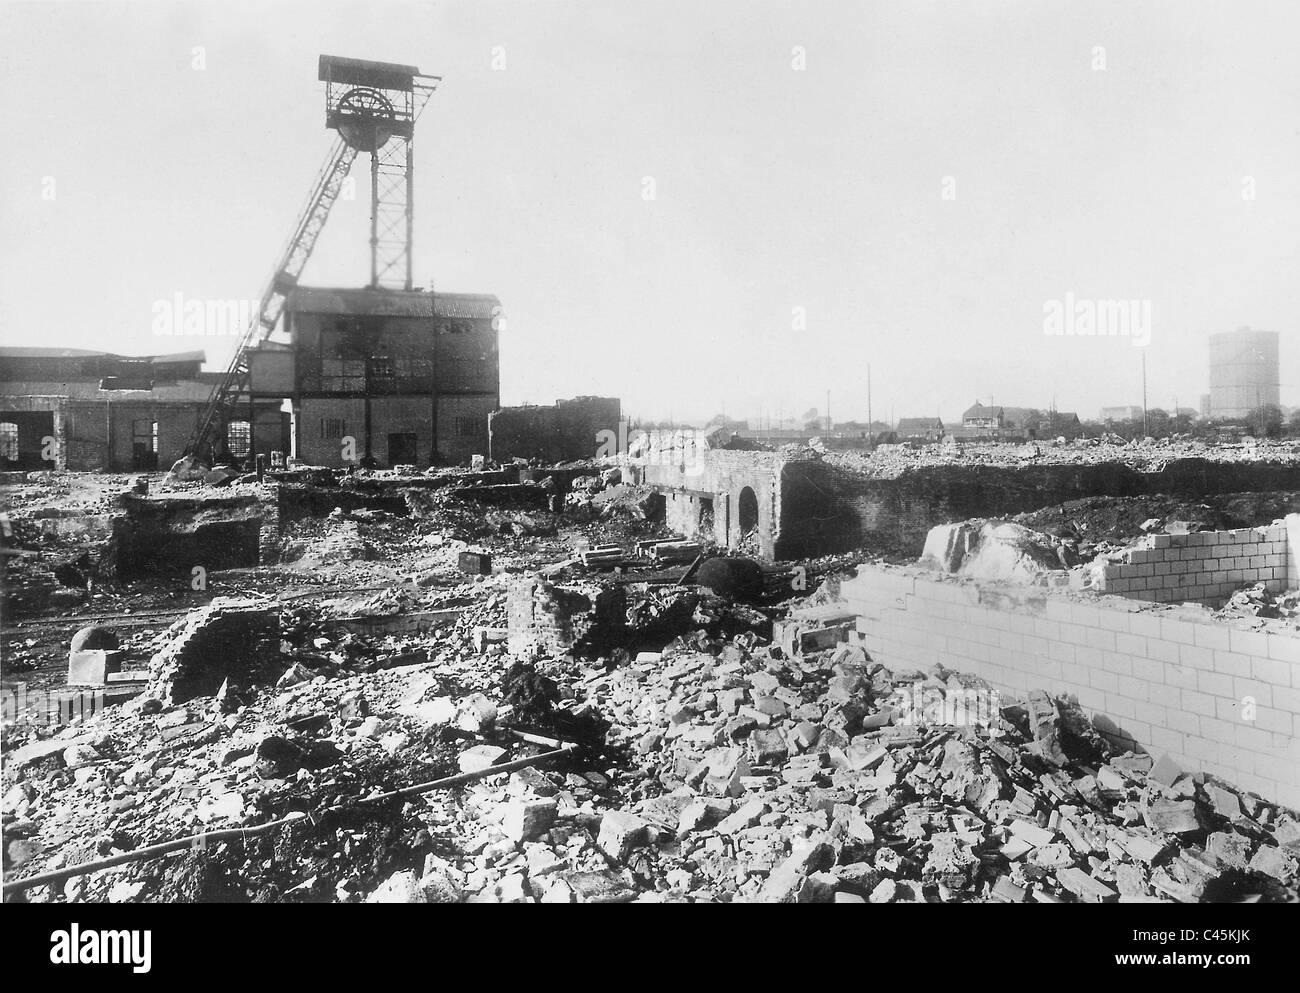 Coal mine, historical - Vollmond mine - Stock Image